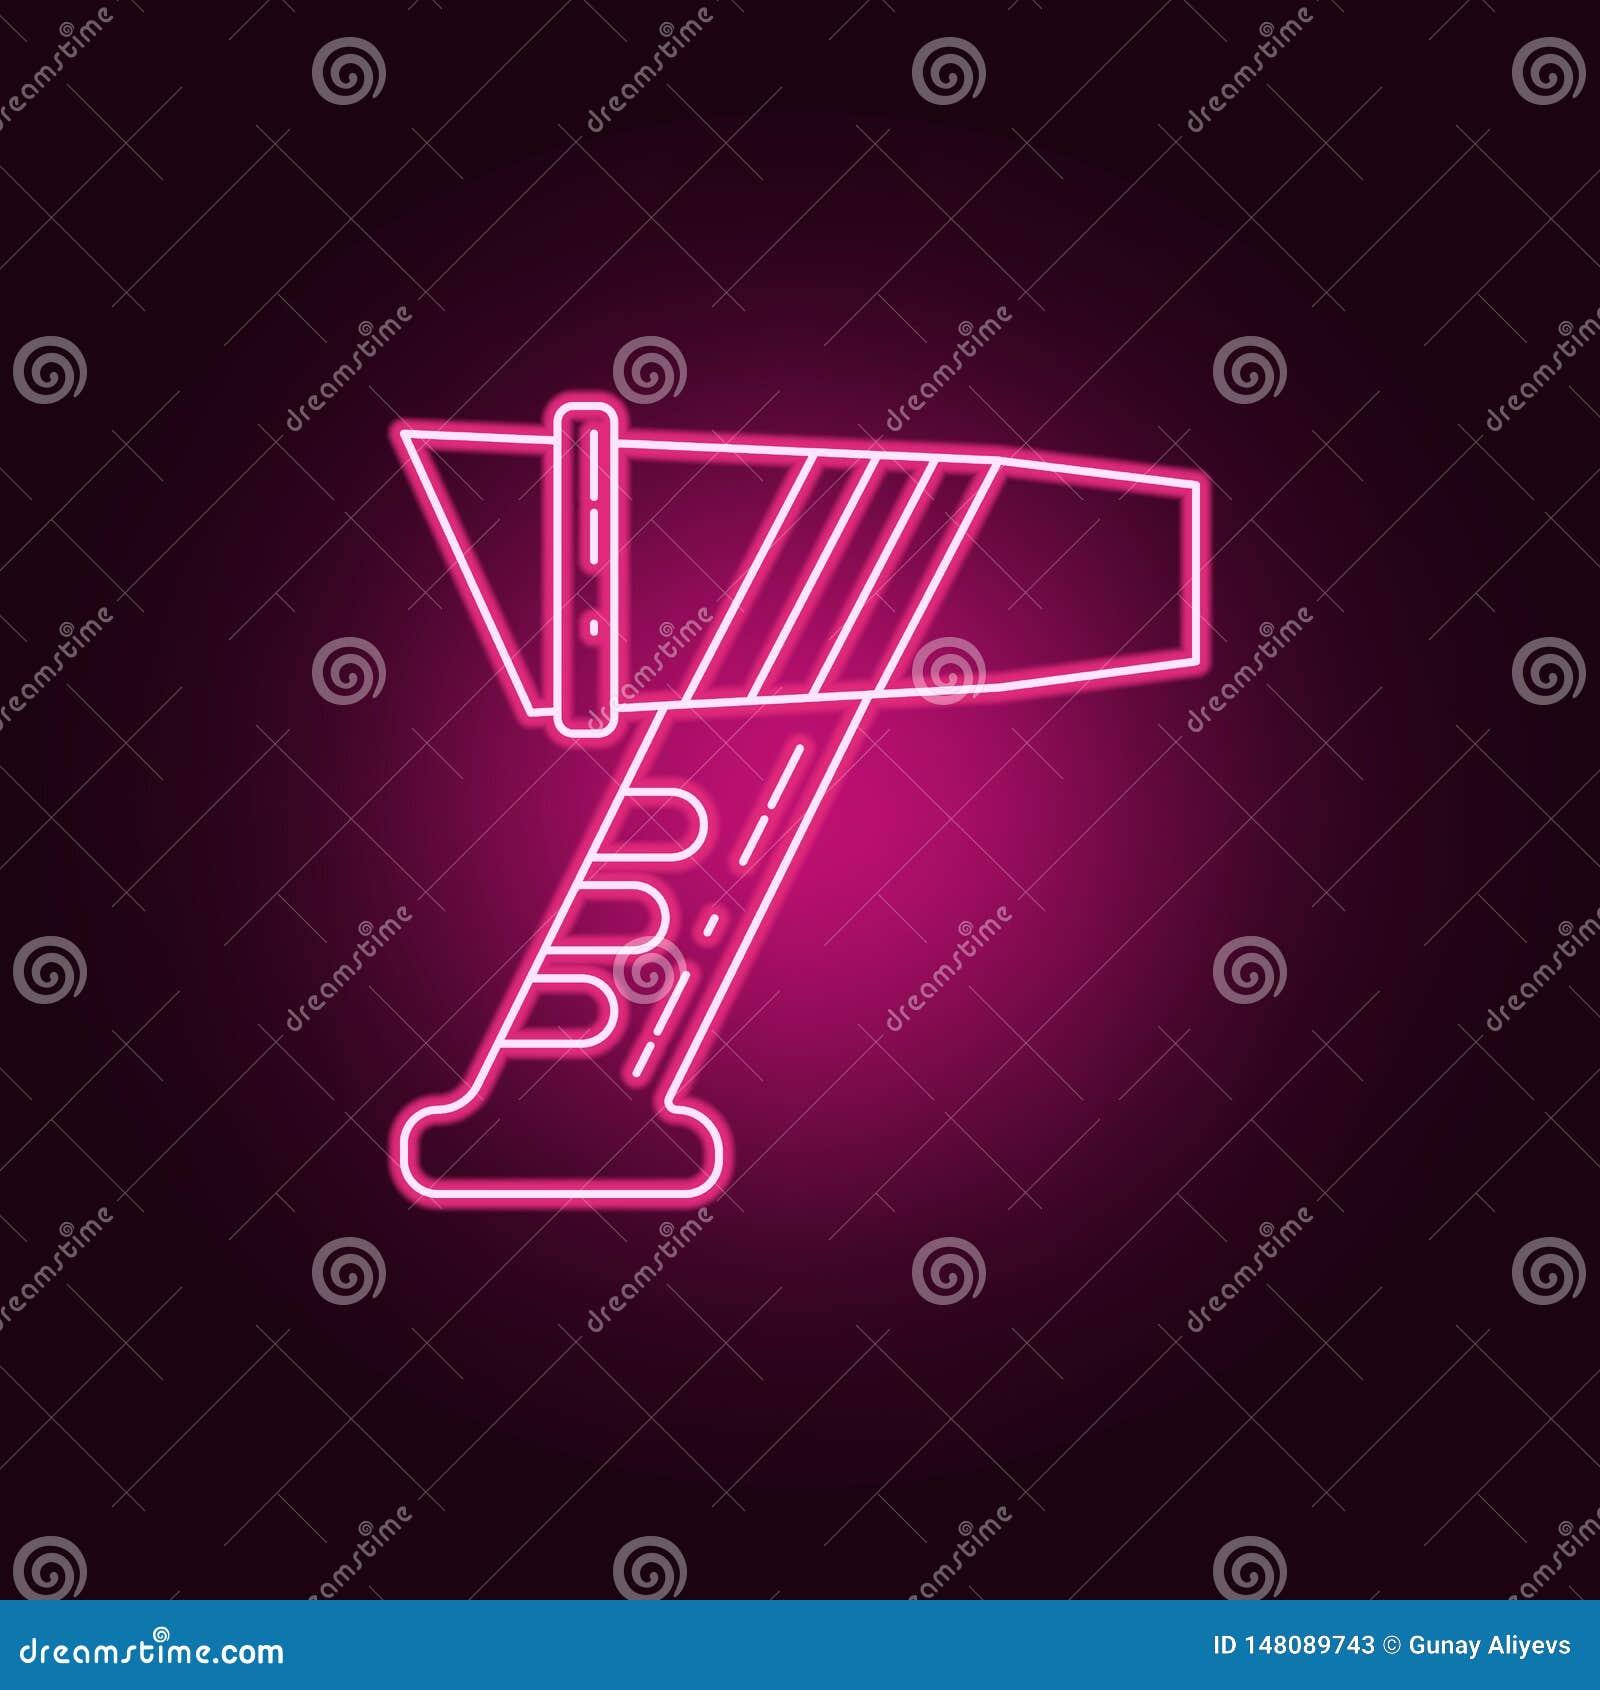 laser measuring instrument neon icon. Elements of Measure set. Simple icon for websites, web design, mobile app, info graphics